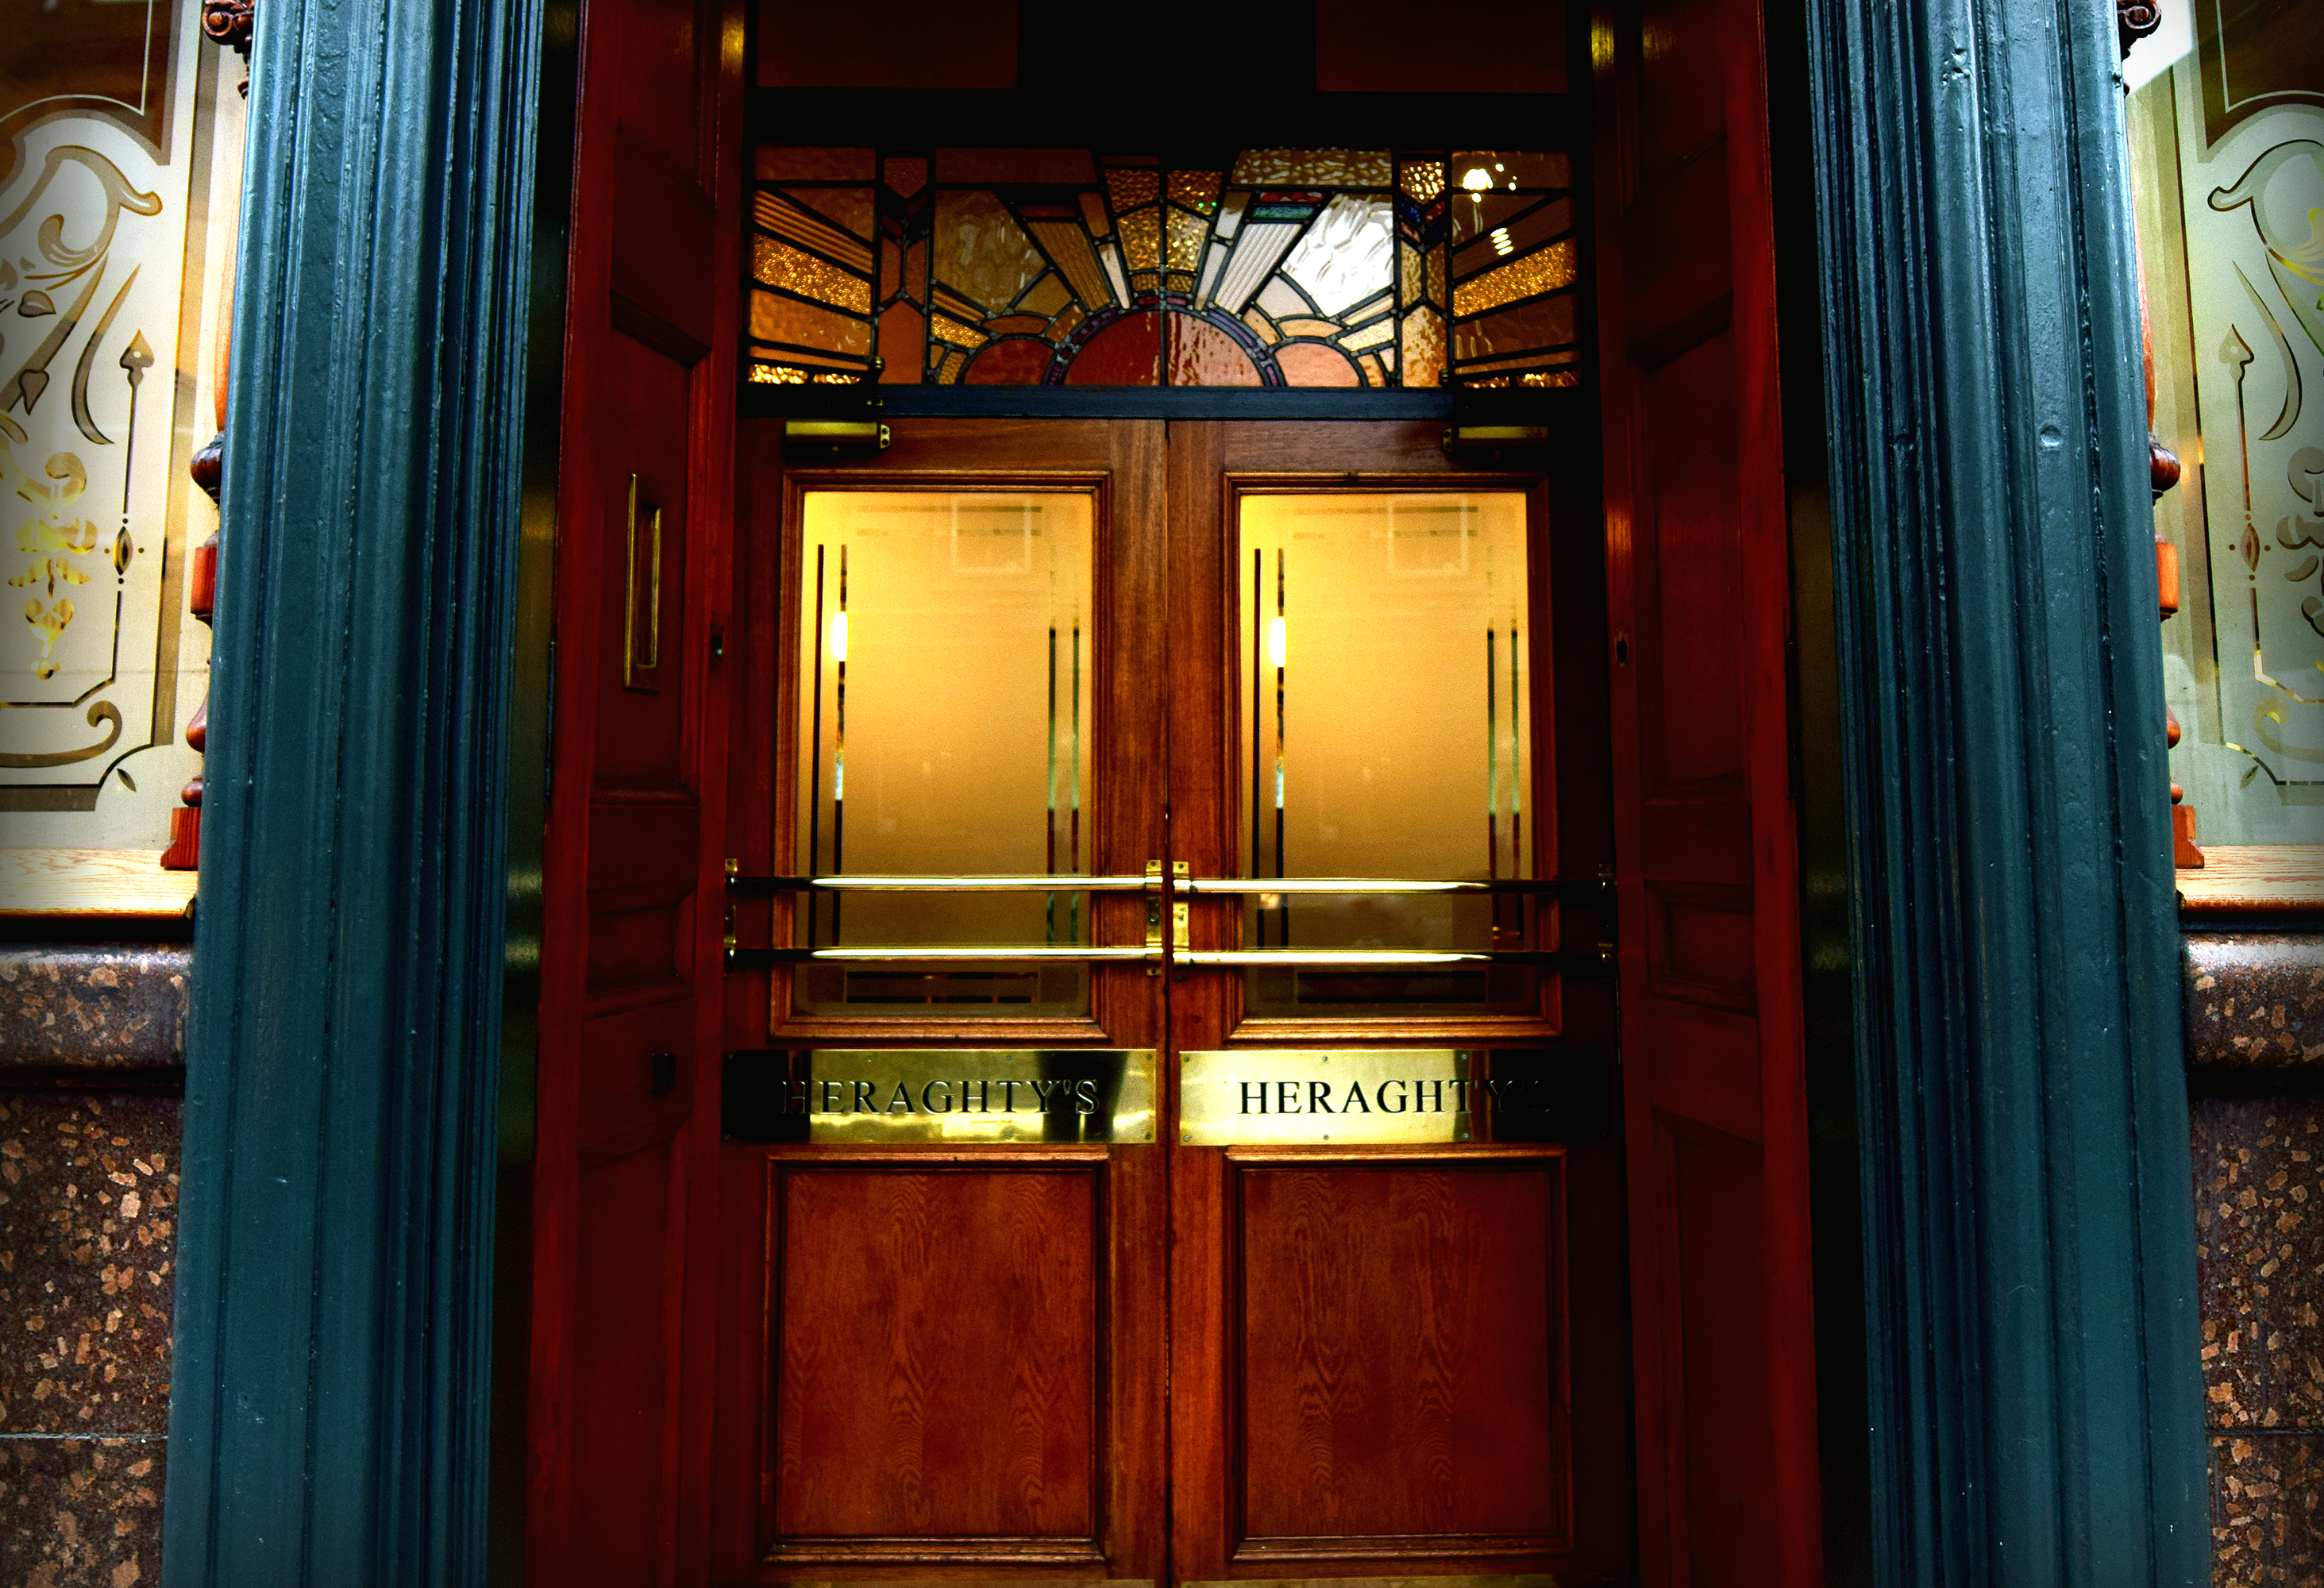 Heraghty' Bar friendly Irish bar